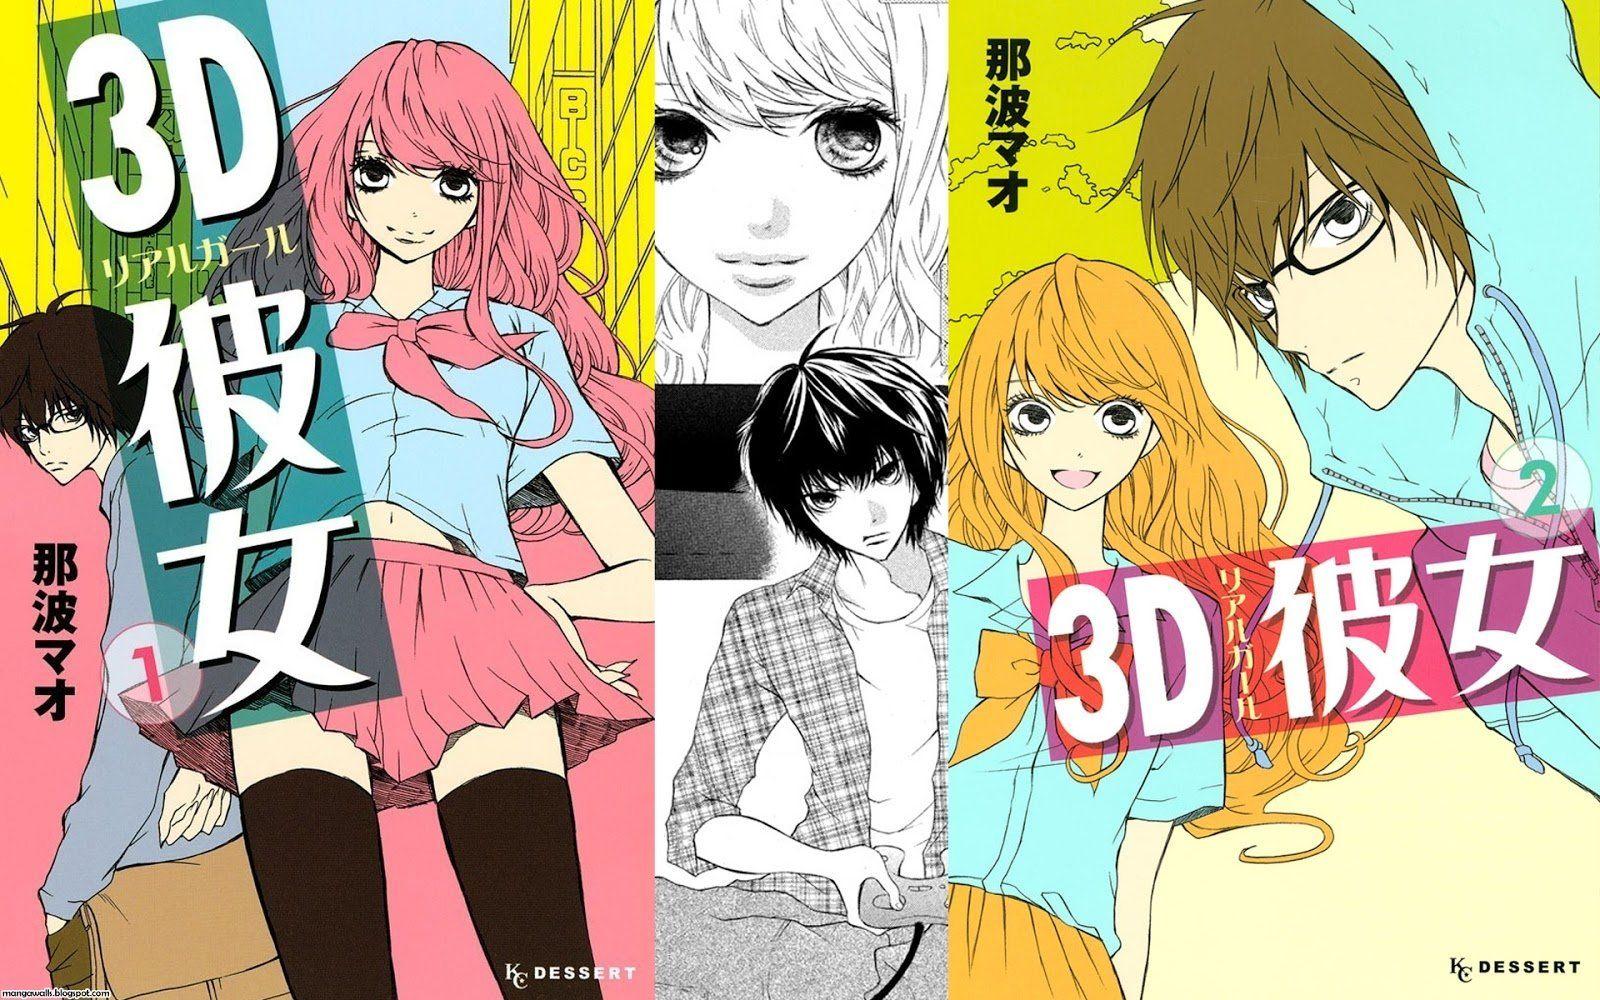 Anime 3d Kanojo Real Girl Iroha Igarashi Hikari Tsutsui Wallpaper